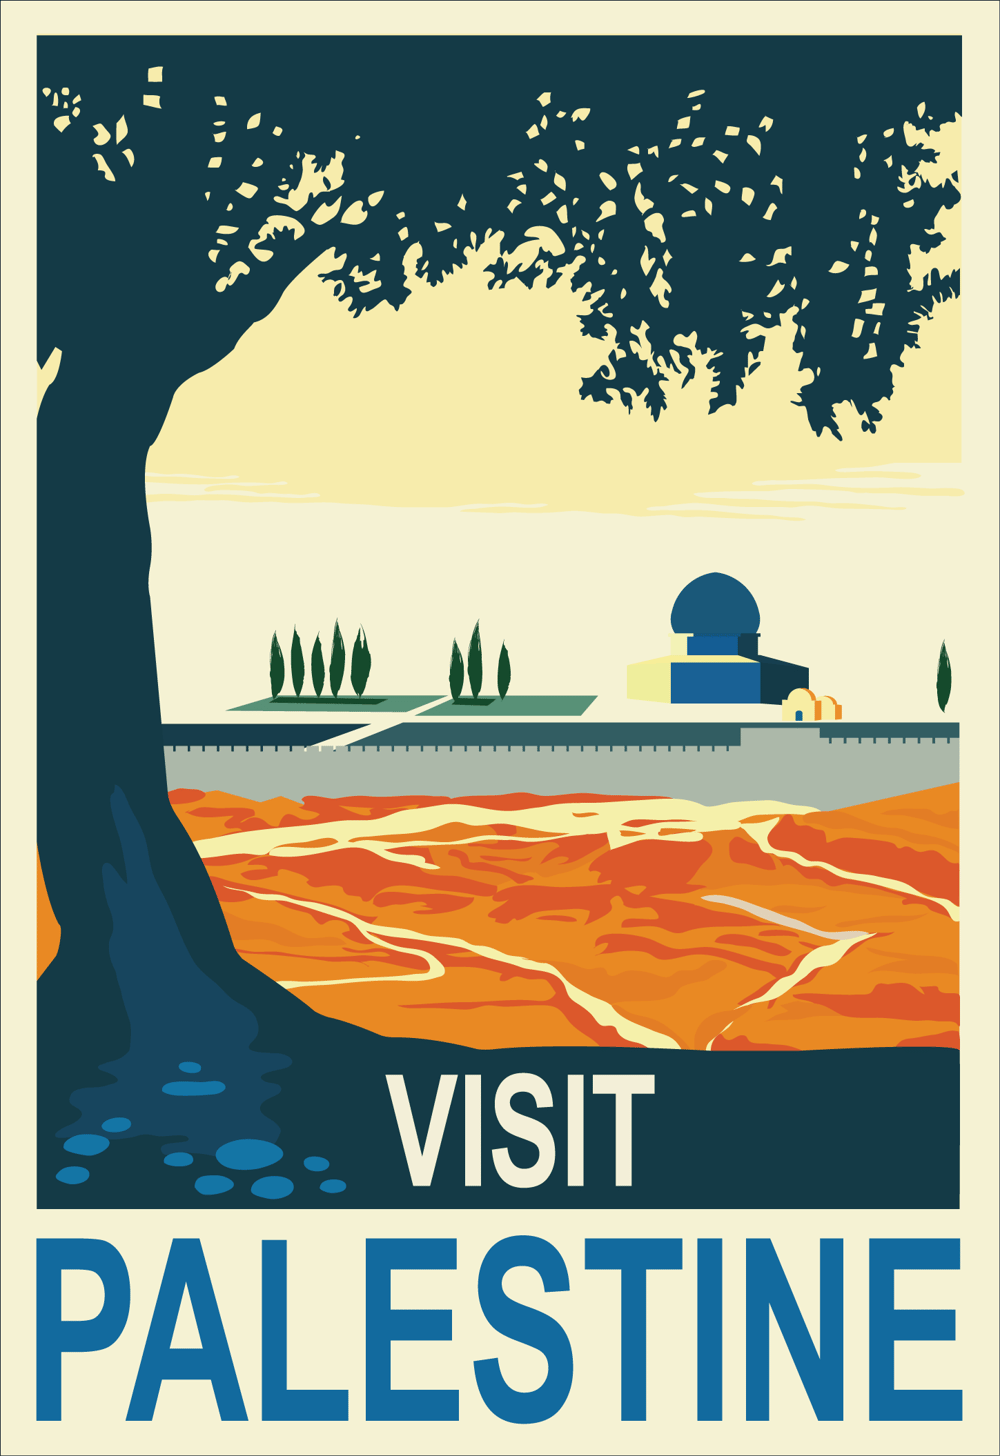 Visit Palestine - image 3 - student project